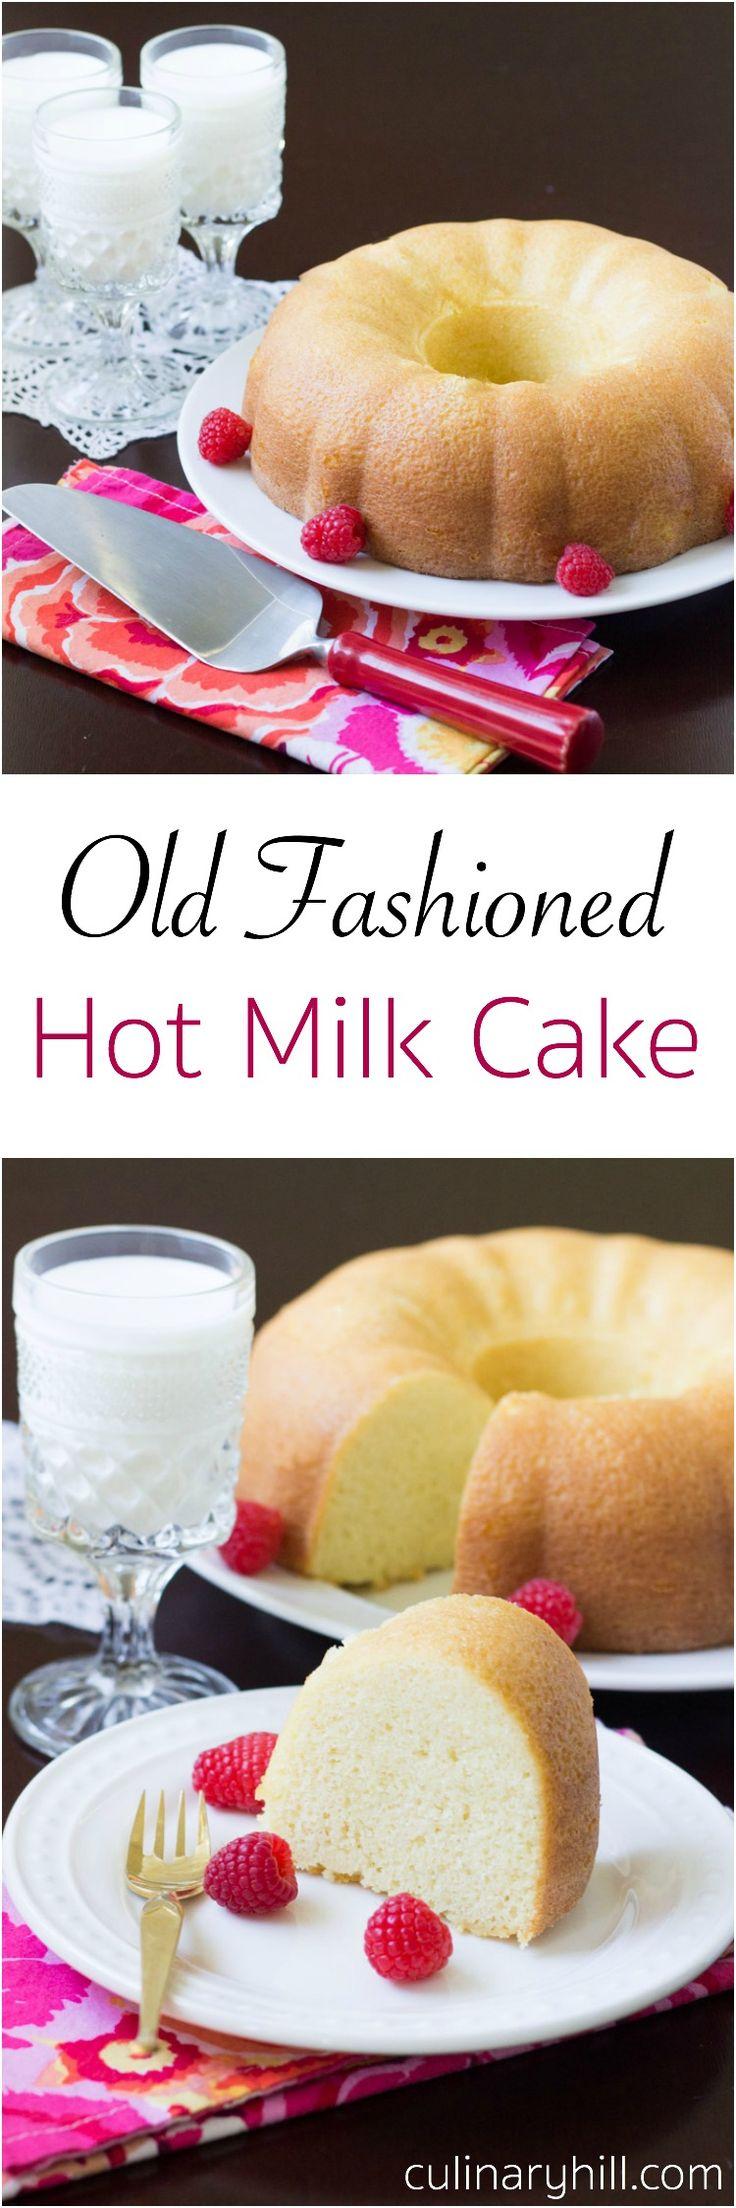 Old Fashioned Hot Milk Cake